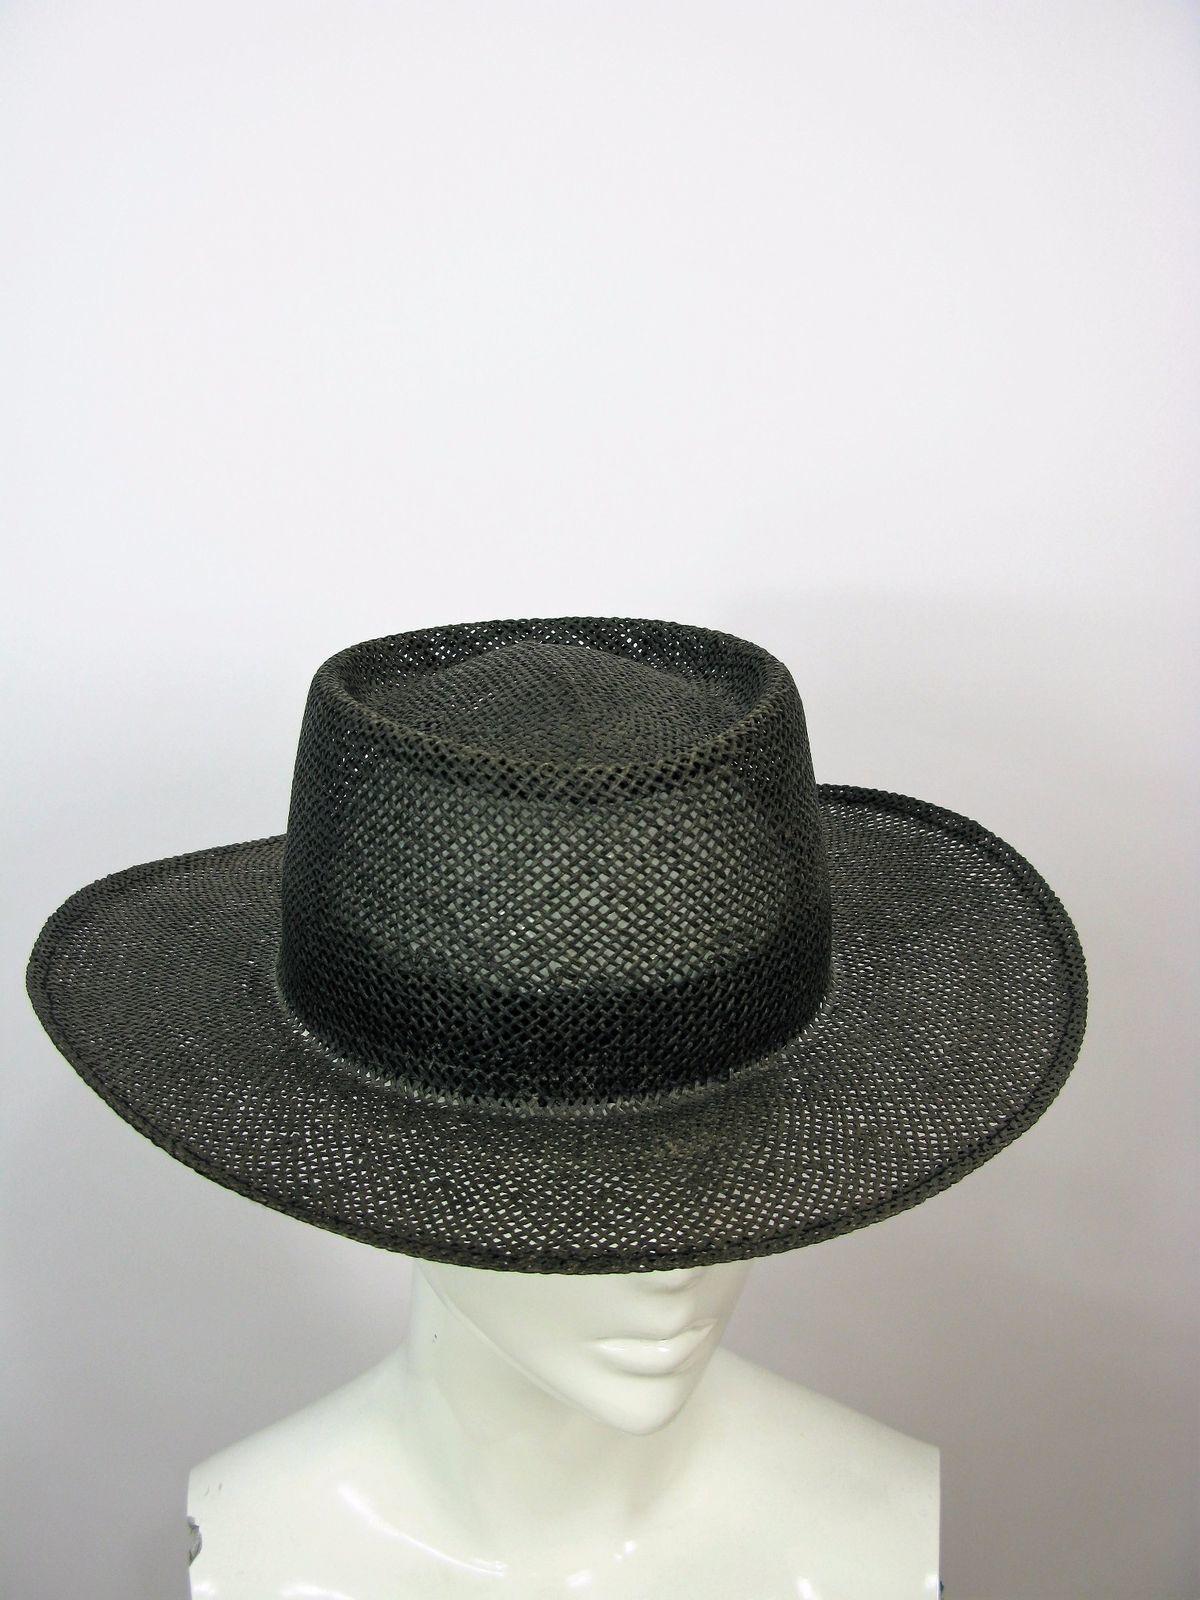 Panama Hat Vintage Genuine Town Talk Louisville Kentucky Panama Hat OS